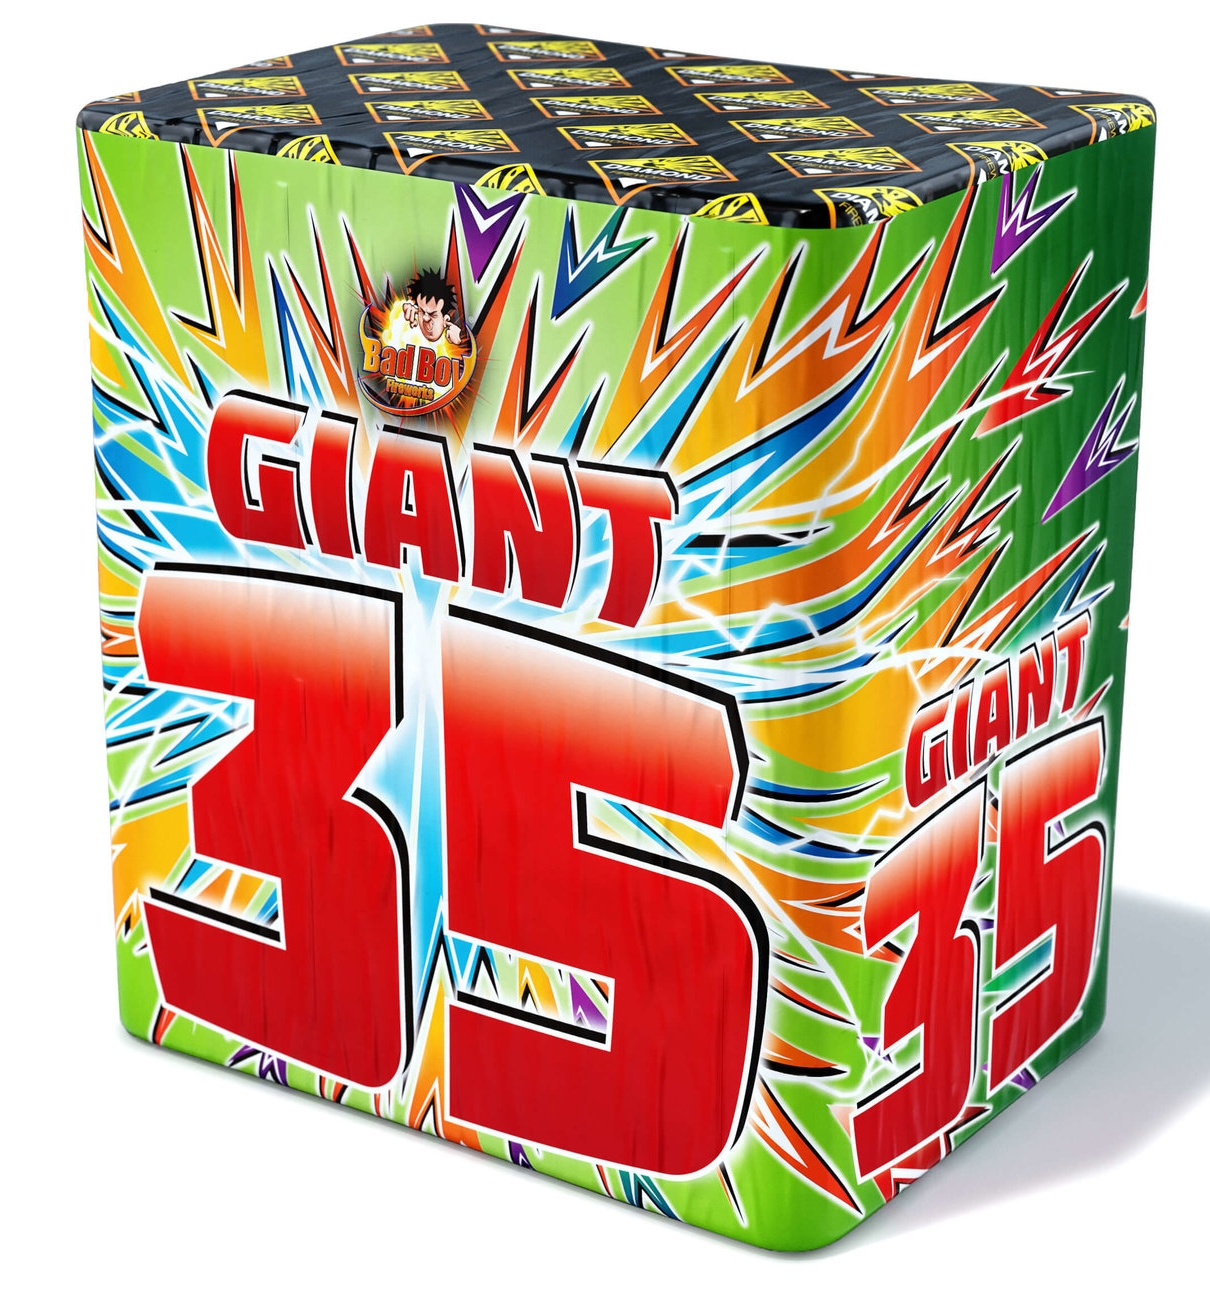 Giant 35 Shot 1.3G - RRP £105.00